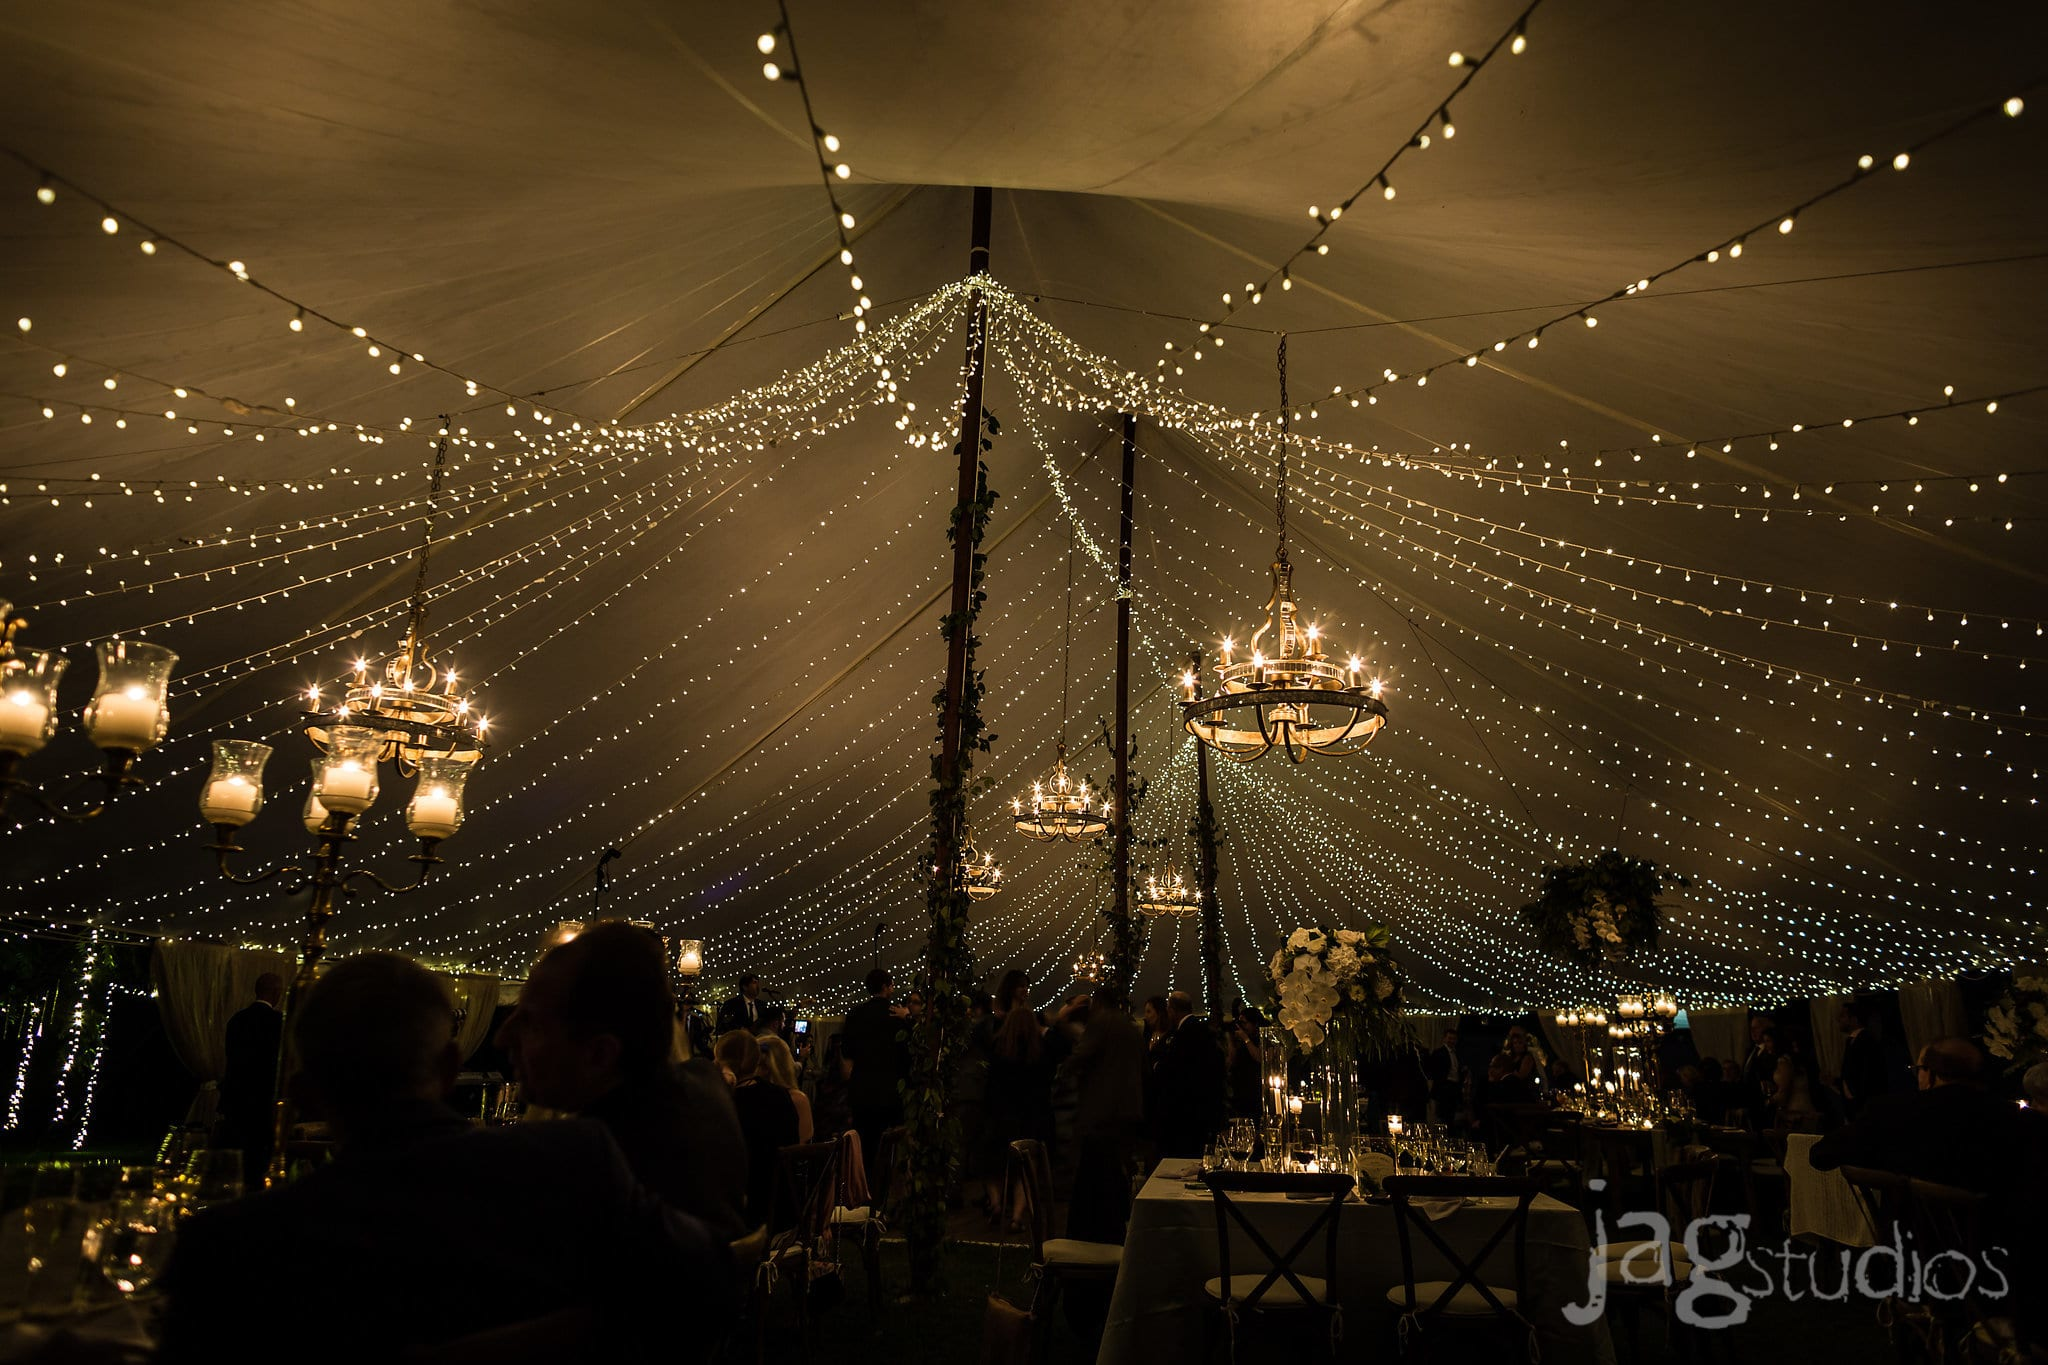 A Midnight Summer Dream lighting installation luxury New England Wedding Jaclyn Watson Events